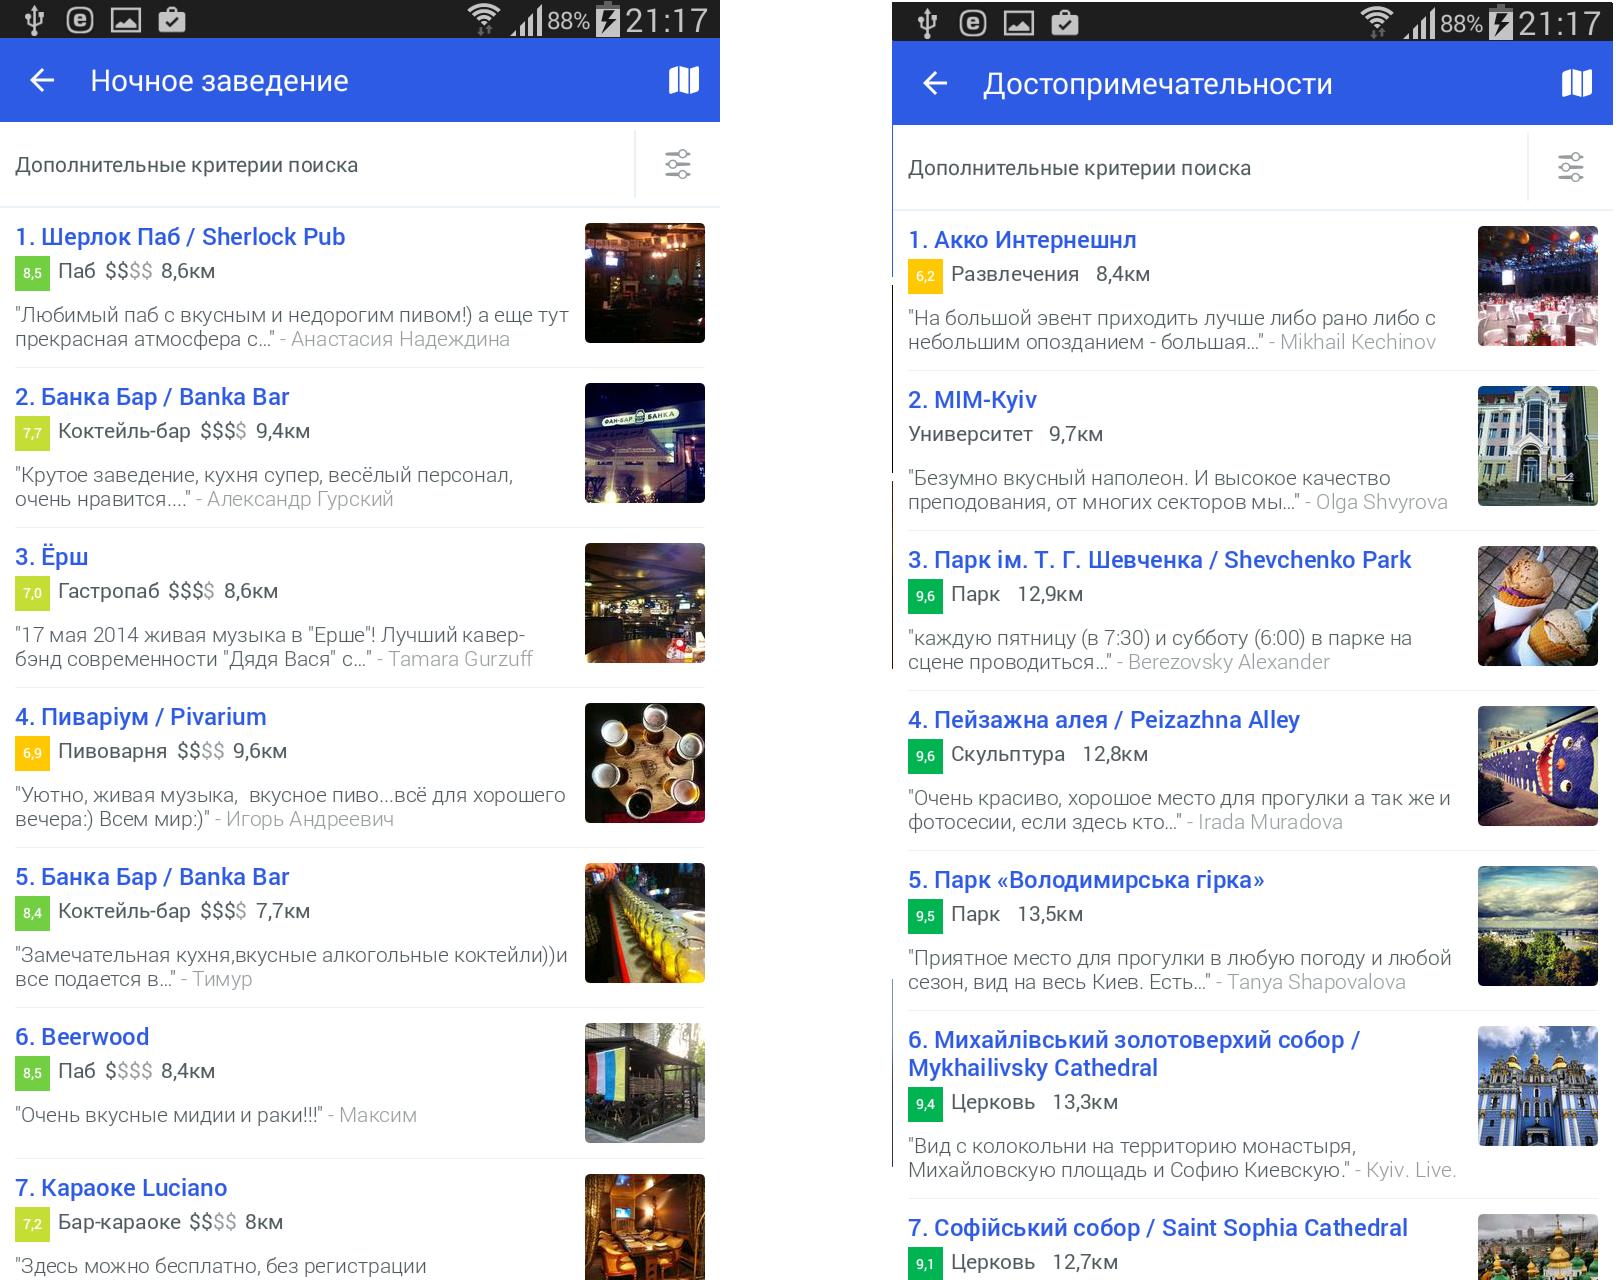 ТОП-20 приложений для Android - Foursquare